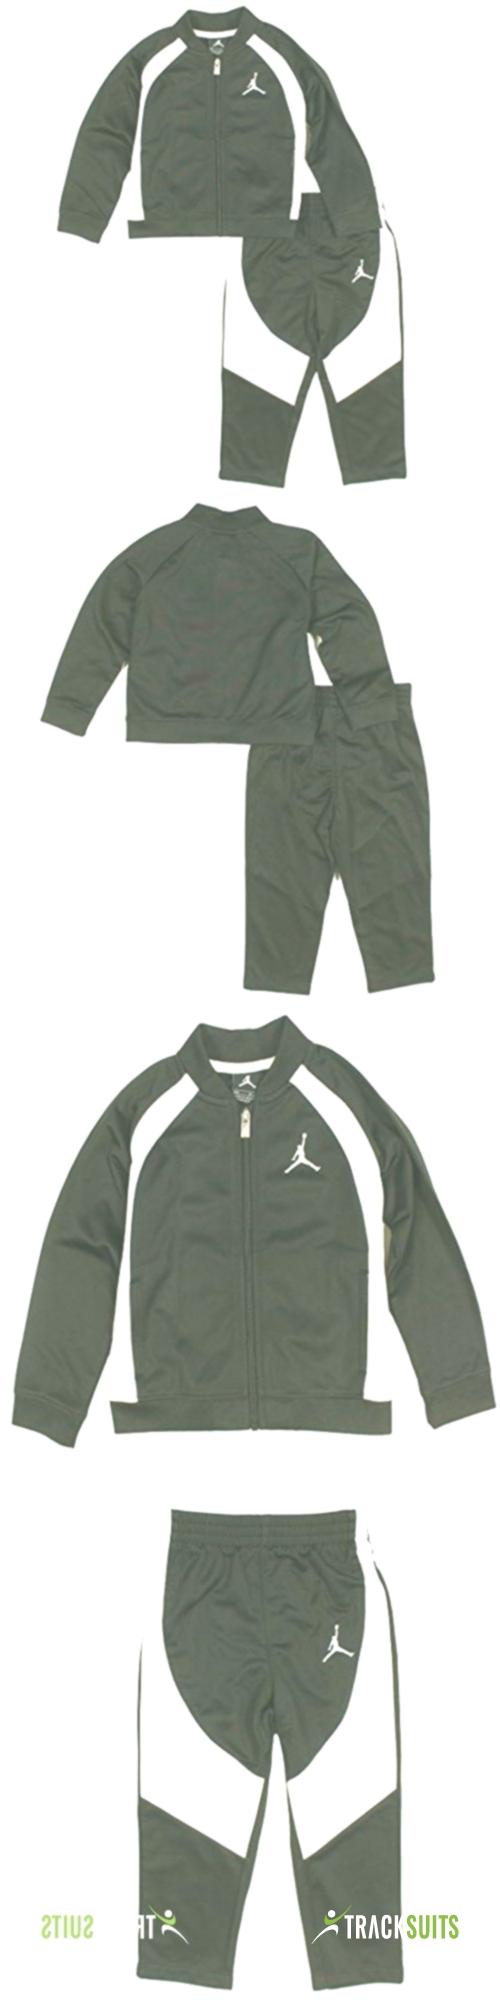 Nike Jordan Jumpman Little Boys Tracksuit Set Jacket and Pants Outfit